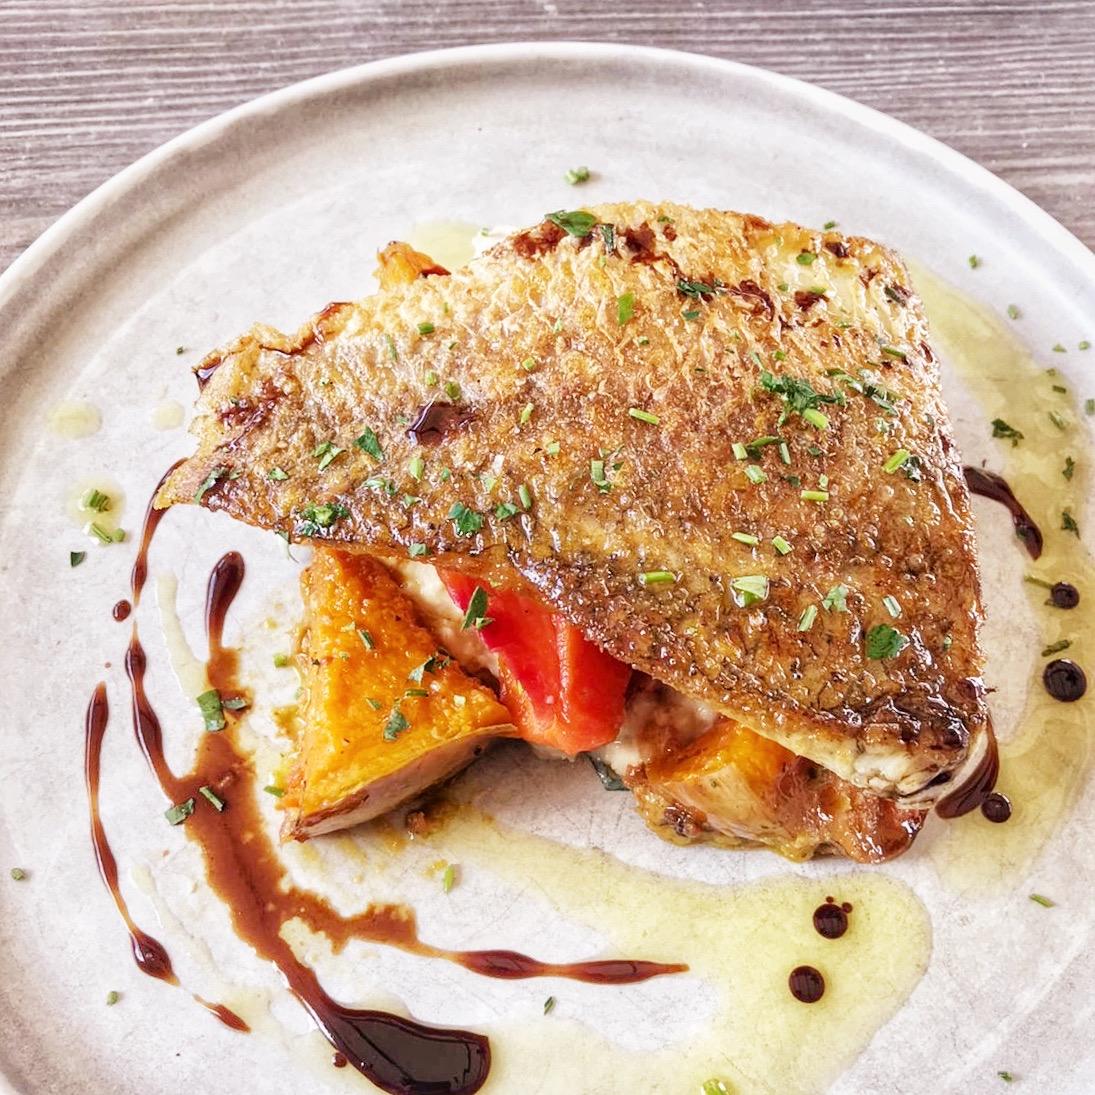 Crispy Skin Barramundi with pesto tossed roasted vegetables, garlic yogurt and chickpea smash